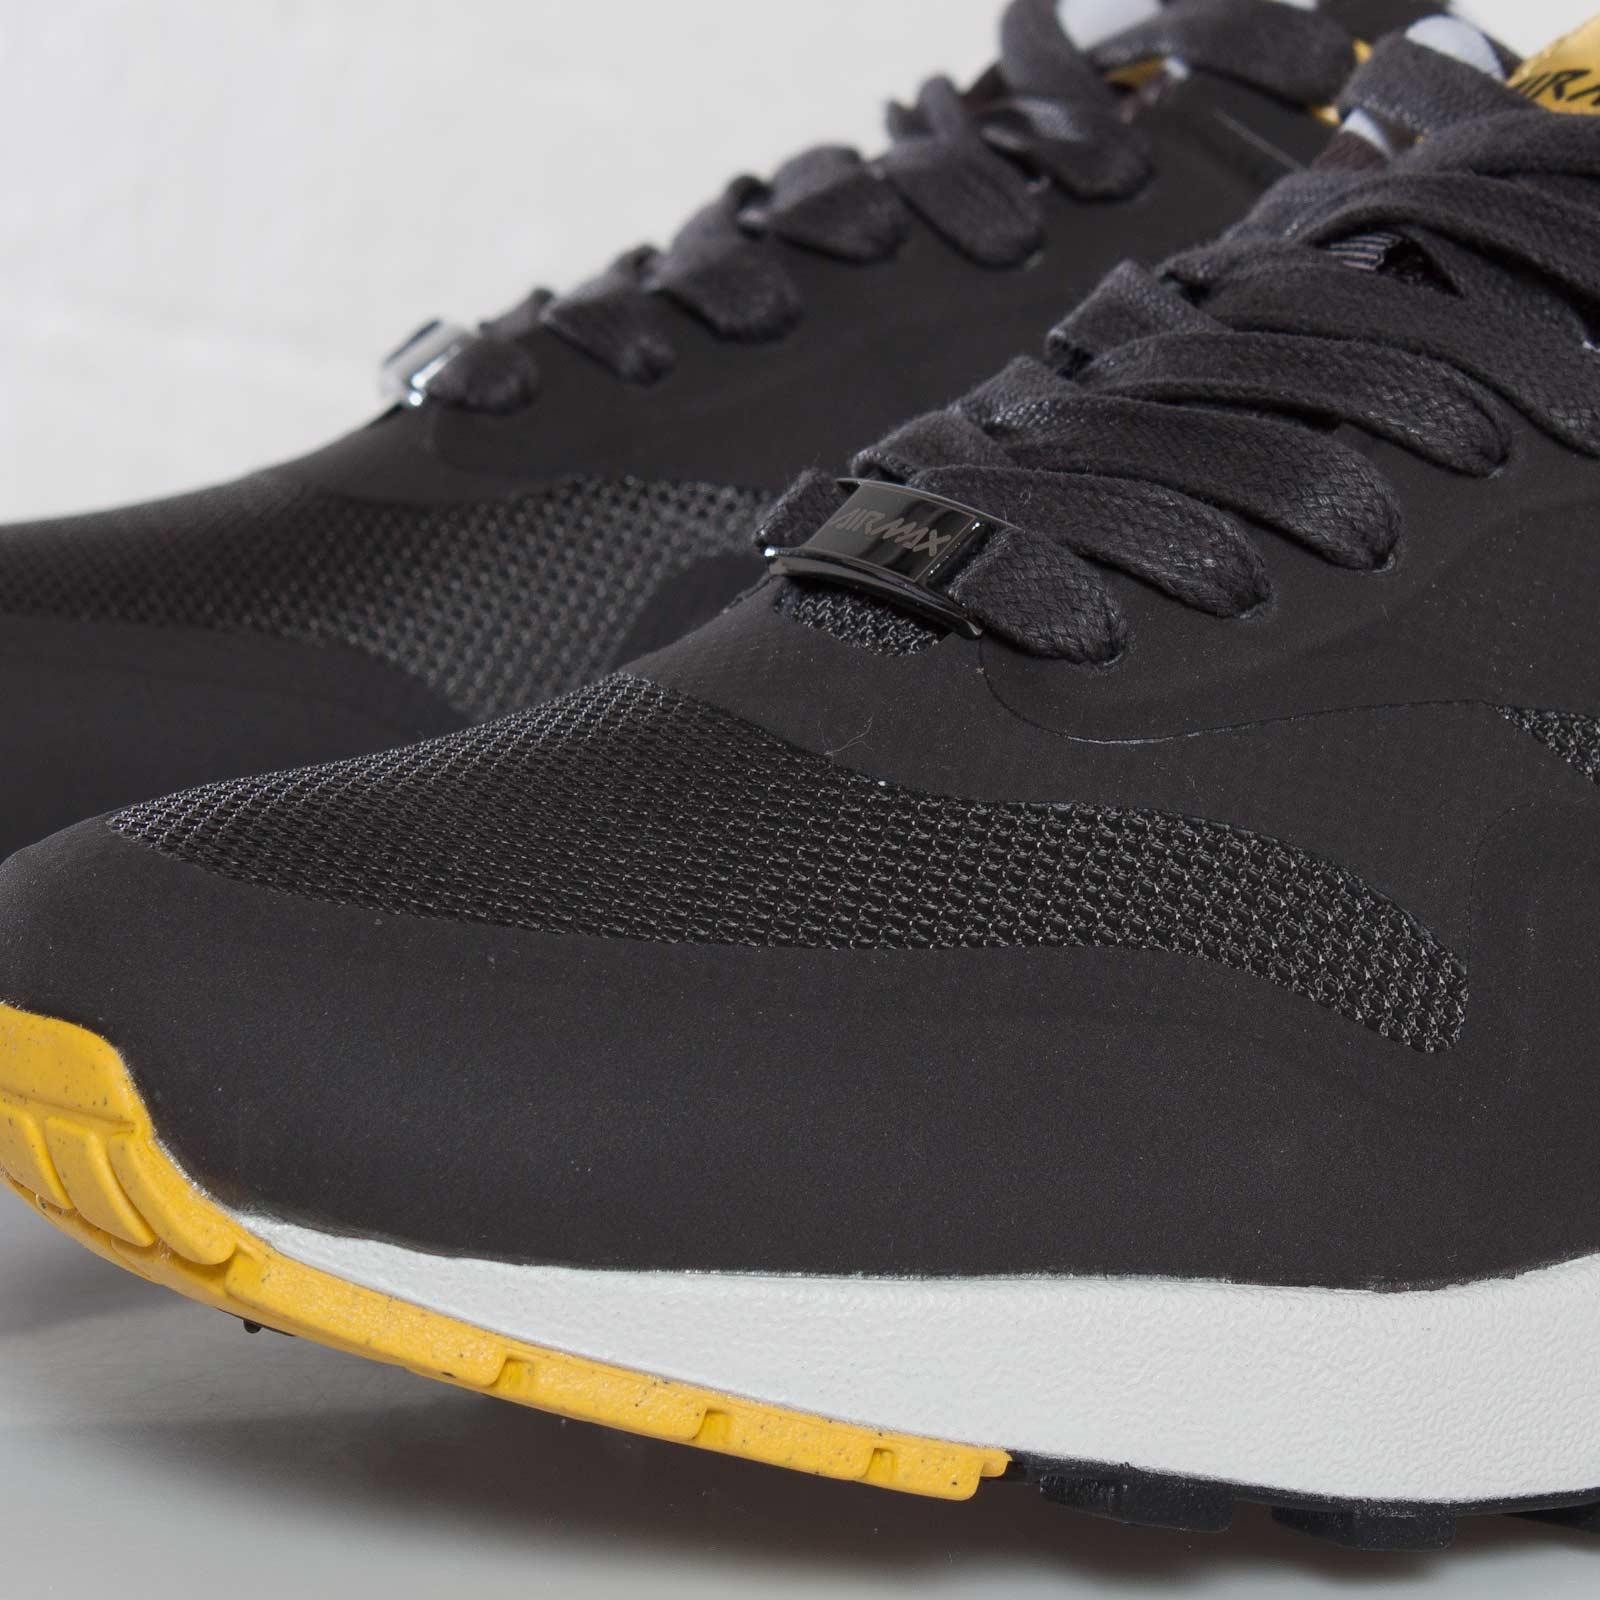 Nike Air Max 1 Paris QS 587923 001 Sneakersnstuff I